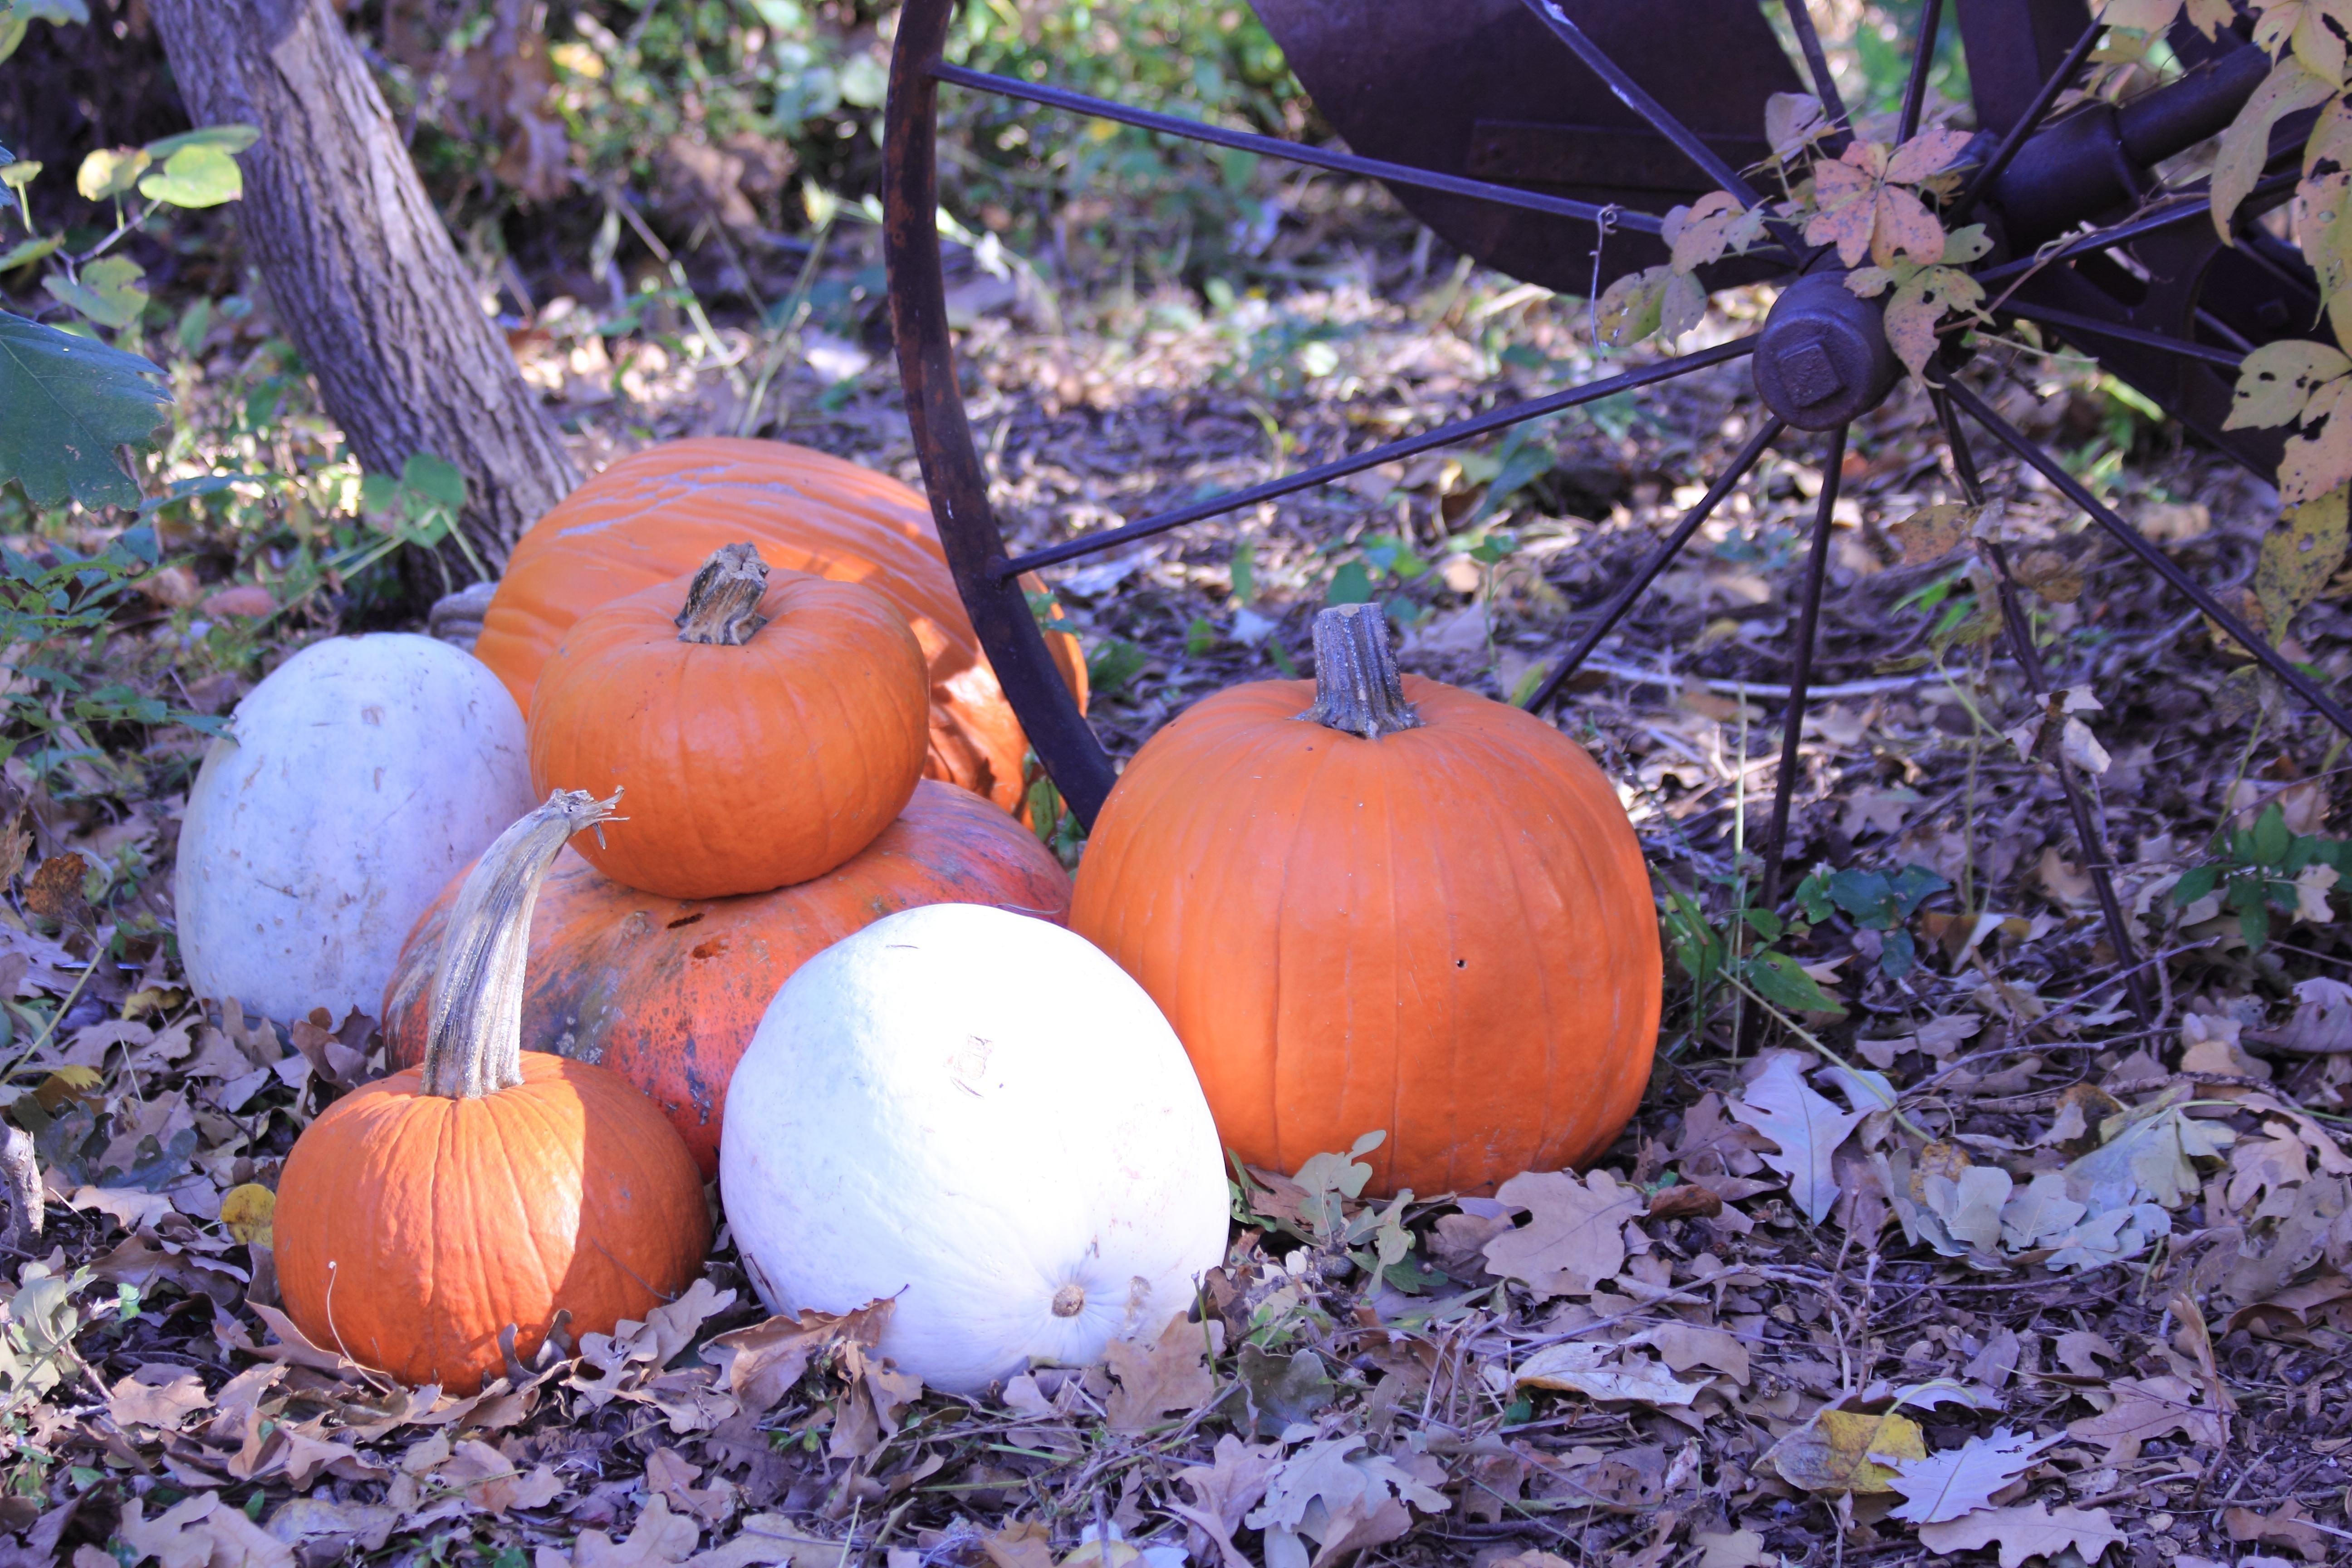 white pumpkins and orange pumpkins - Growing Halloween Pumpkins